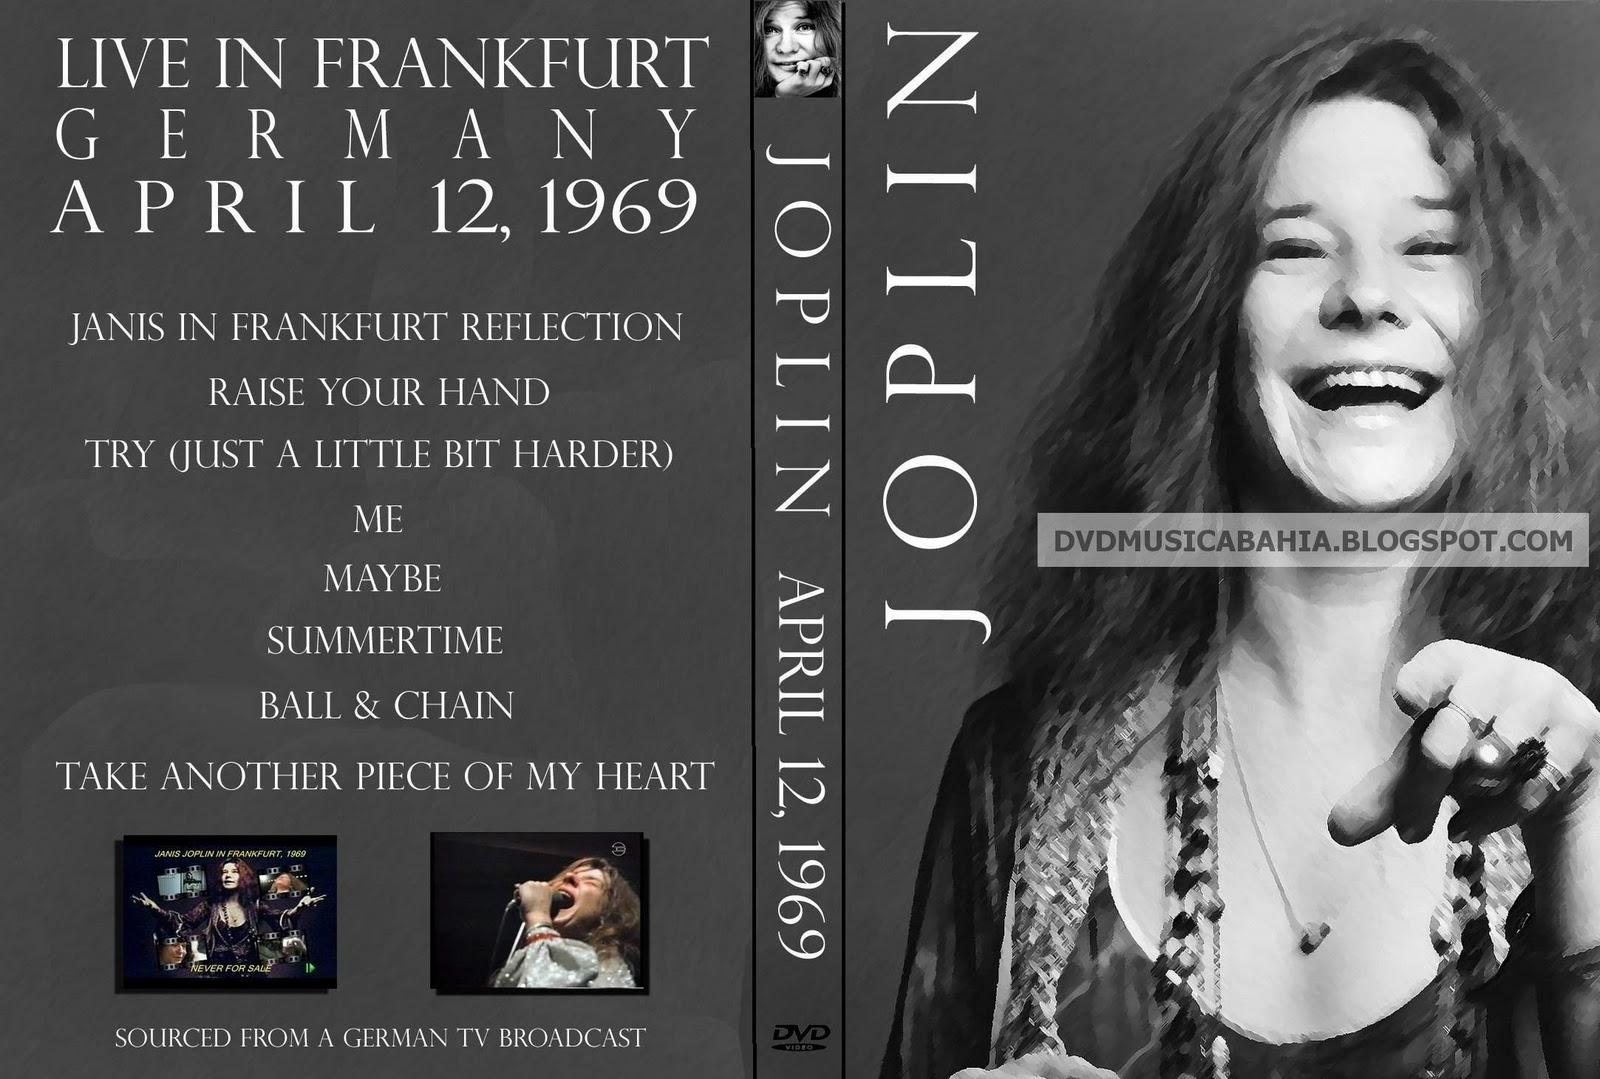 http://2.bp.blogspot.com/-k_EcQNhOGuY/TZpQXT4shRI/AAAAAAAABjI/wwMxFngTcS8/s1600/JANIS+JOPLIN+-+LIVE+IN+FRANKFURT+1969.jpg